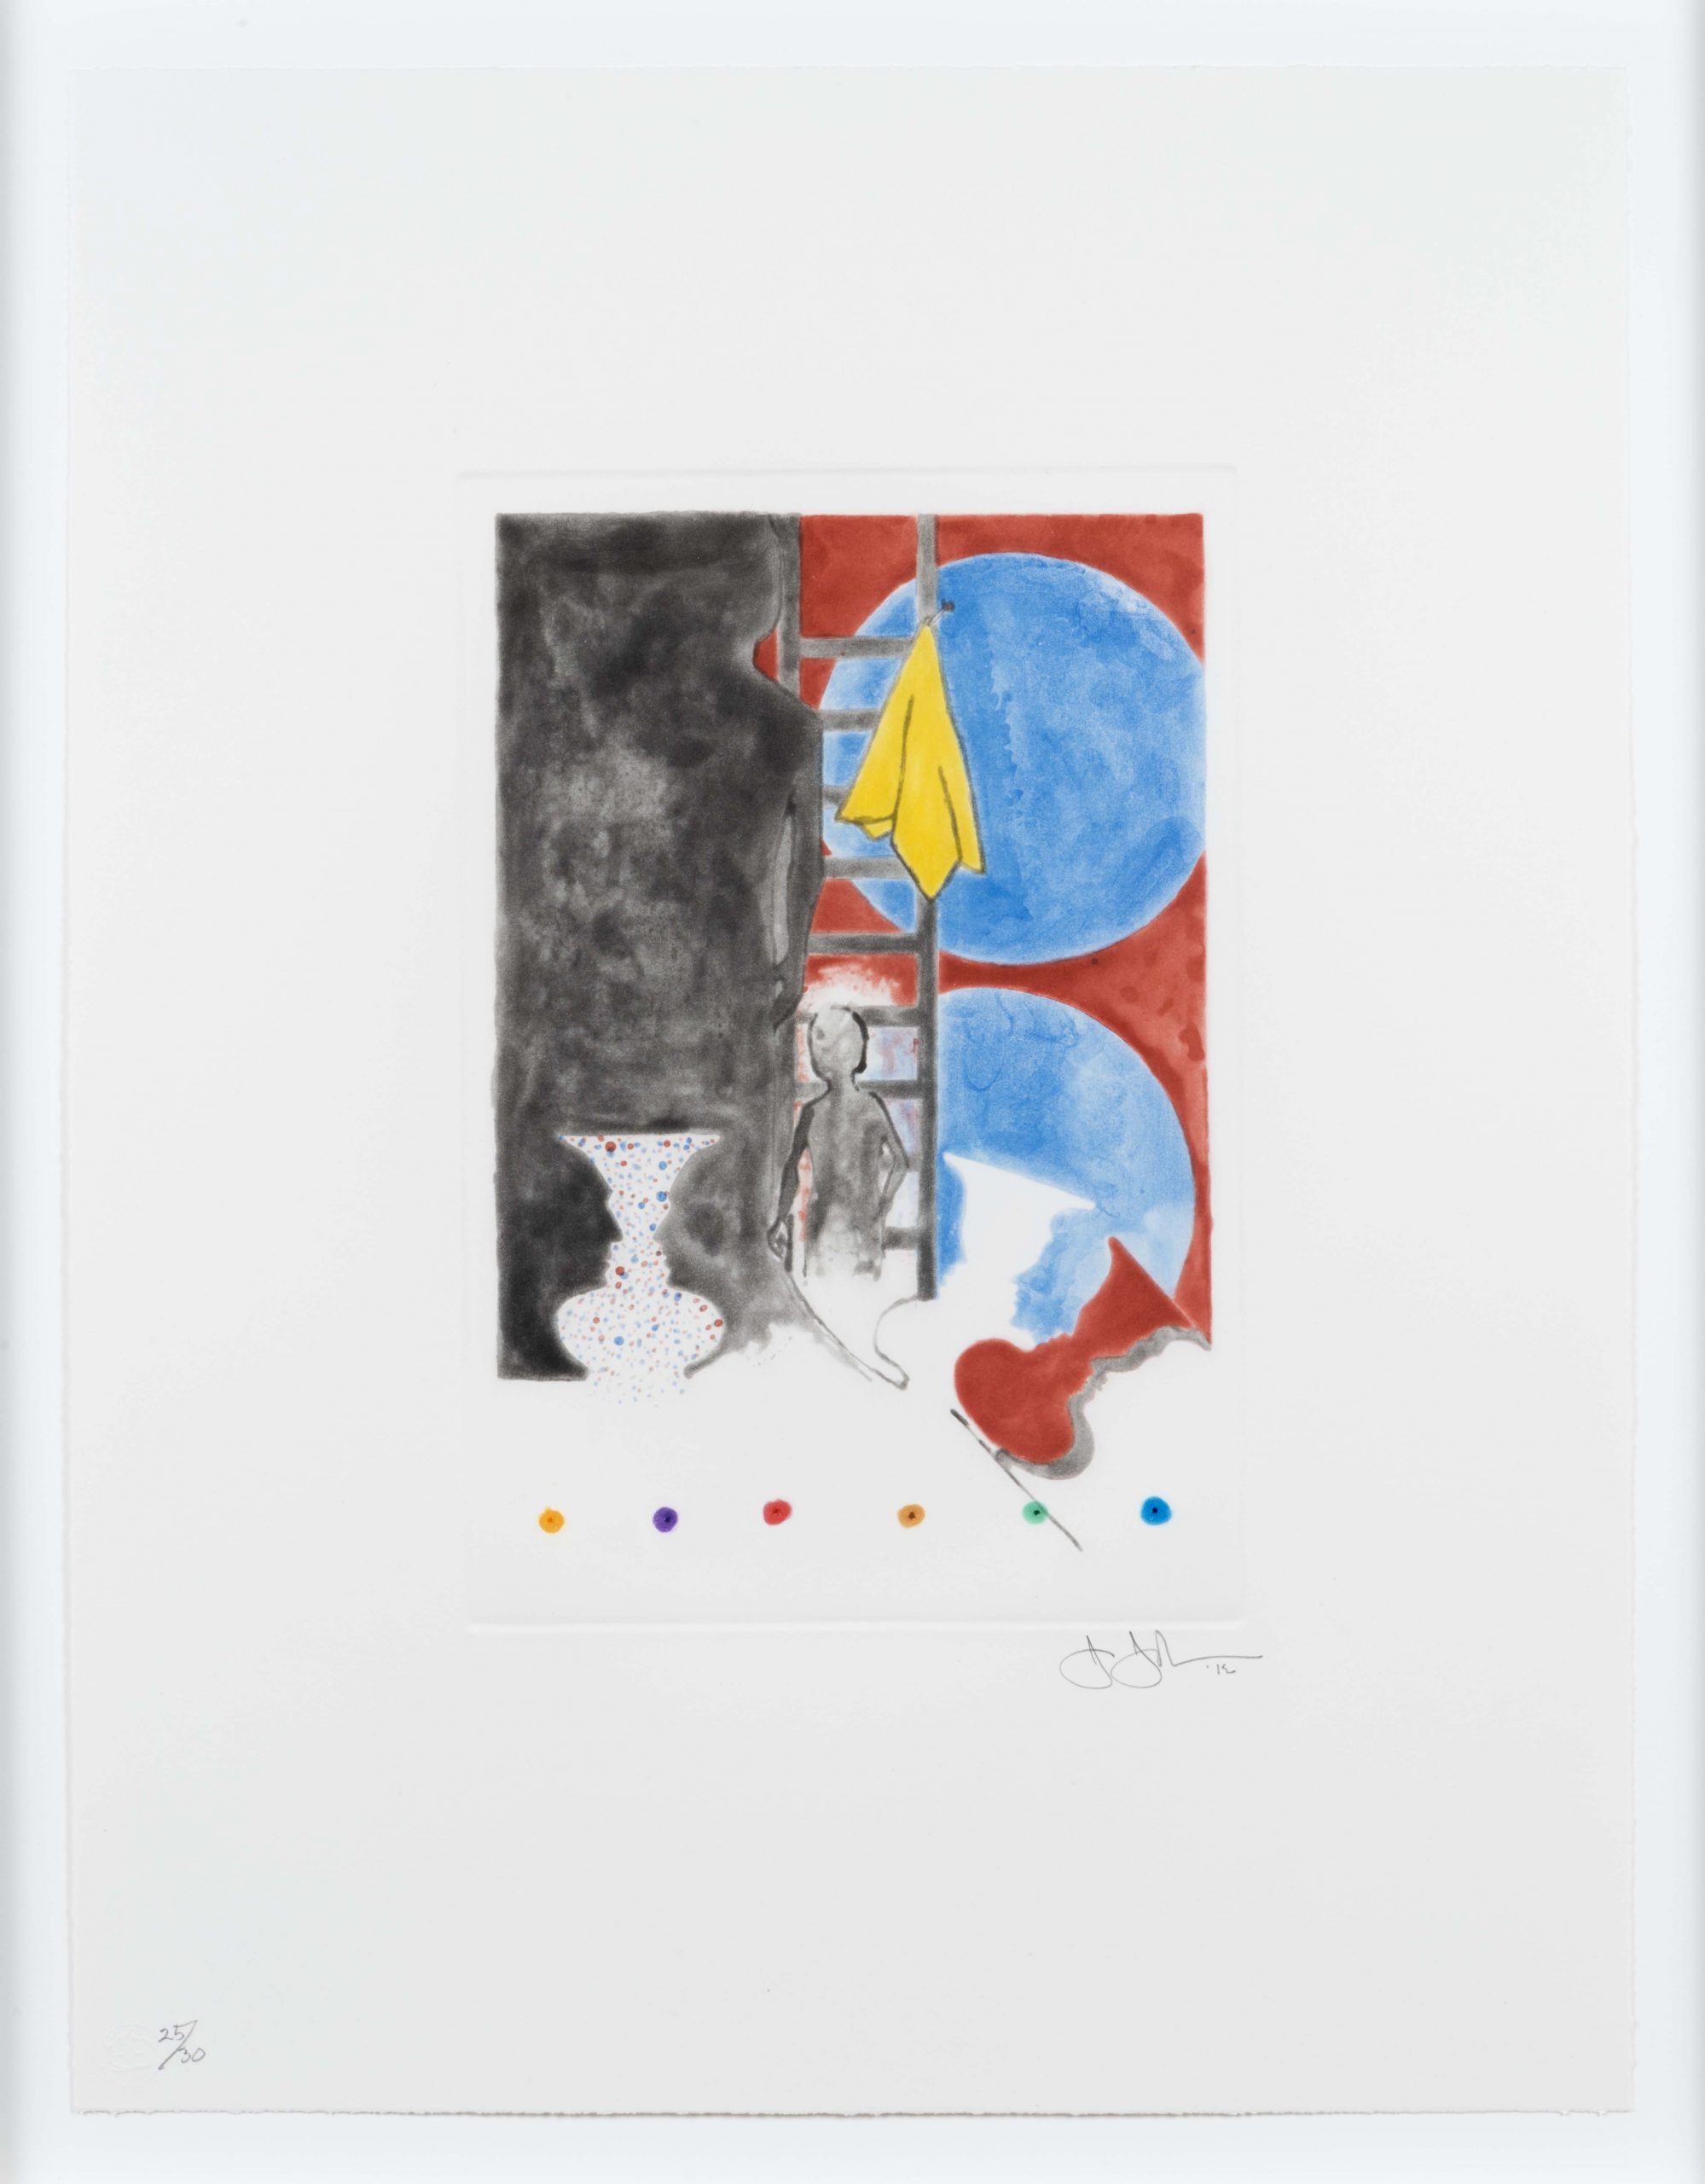 Untitled by Jasper Johns